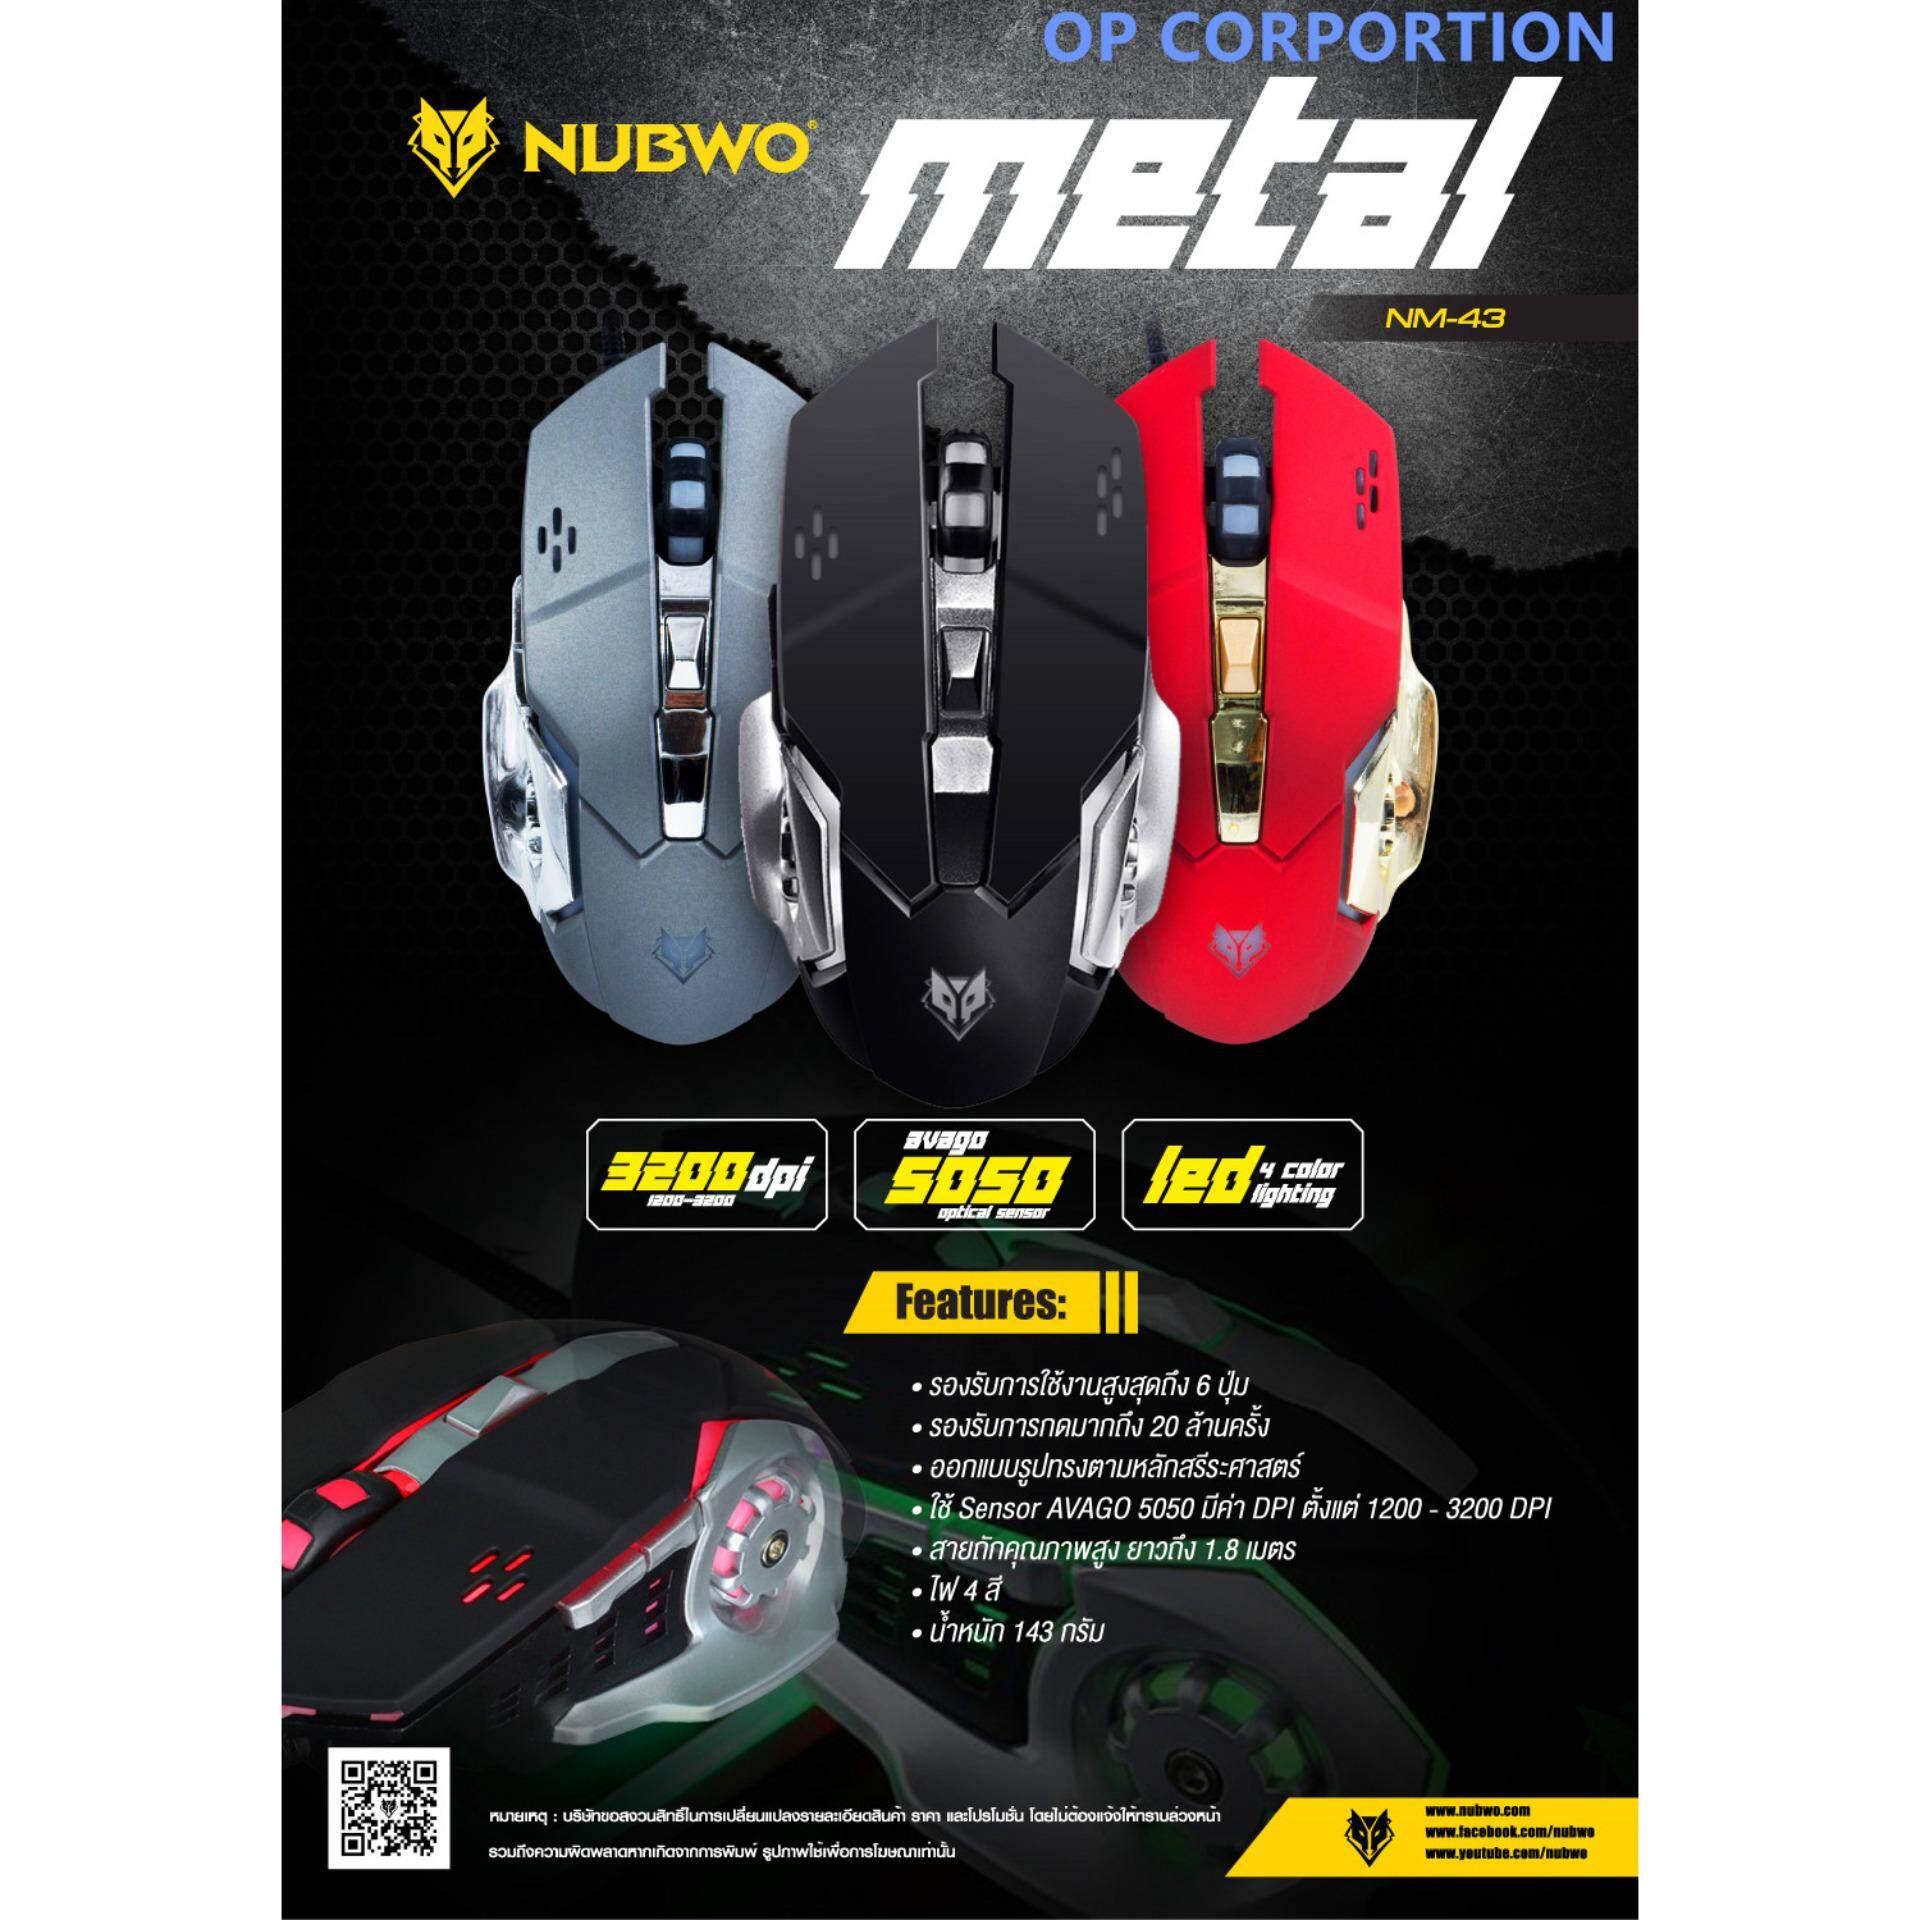 Nubwo Metal Gaming Mouse Nm 43 เม้าส์เกมส์มิ่ง มีไฟ ถูก